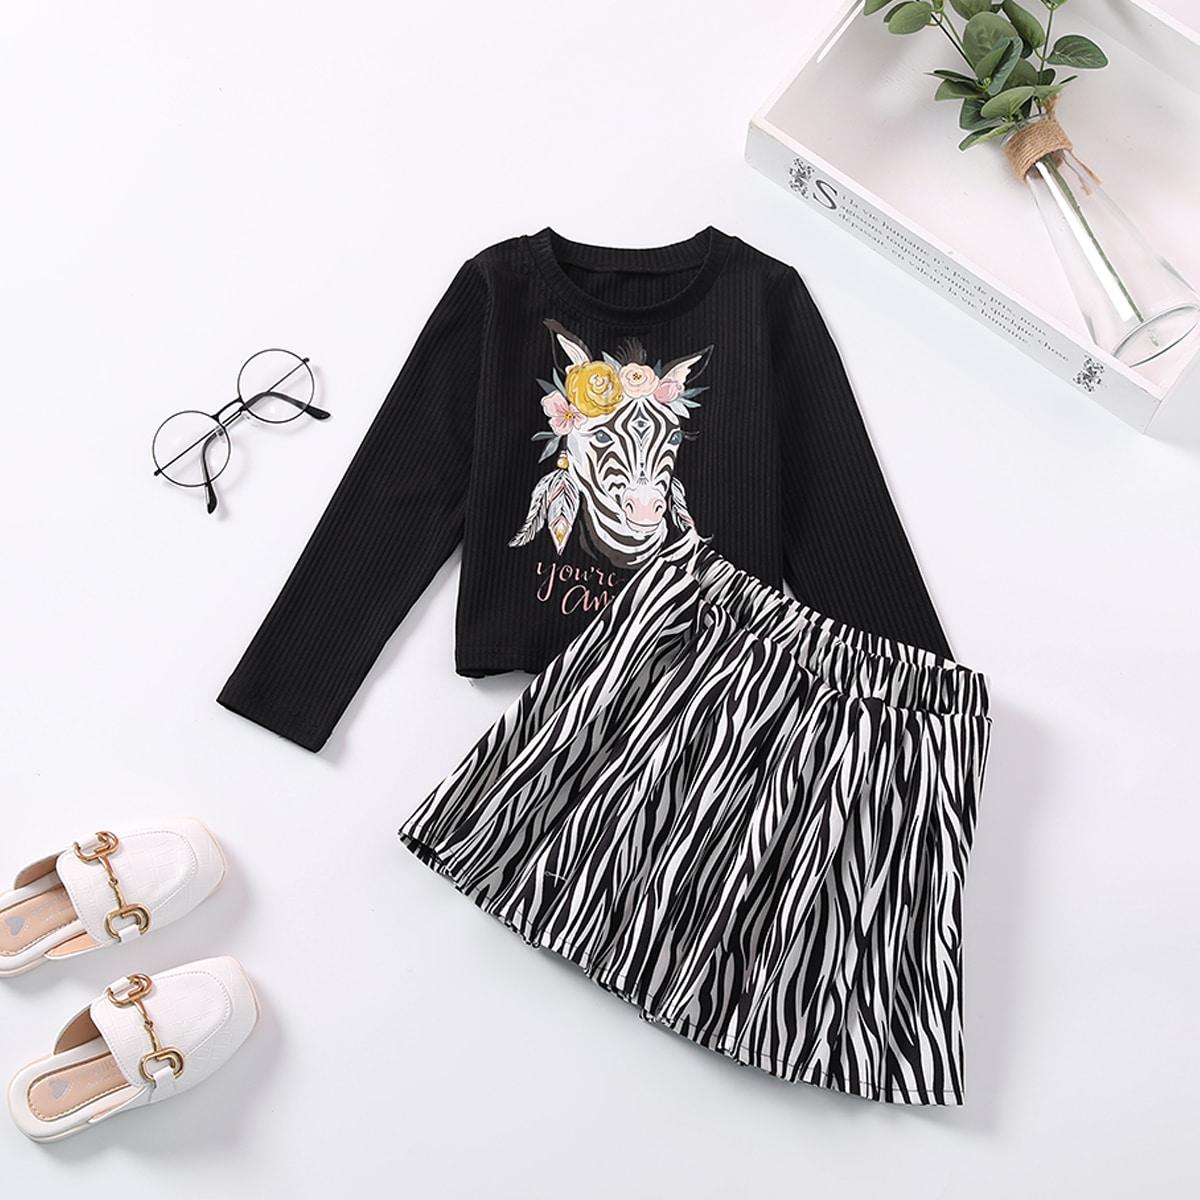 Toddler Girls Floral & Zebra Print Tee & Zebra Striped Skirt